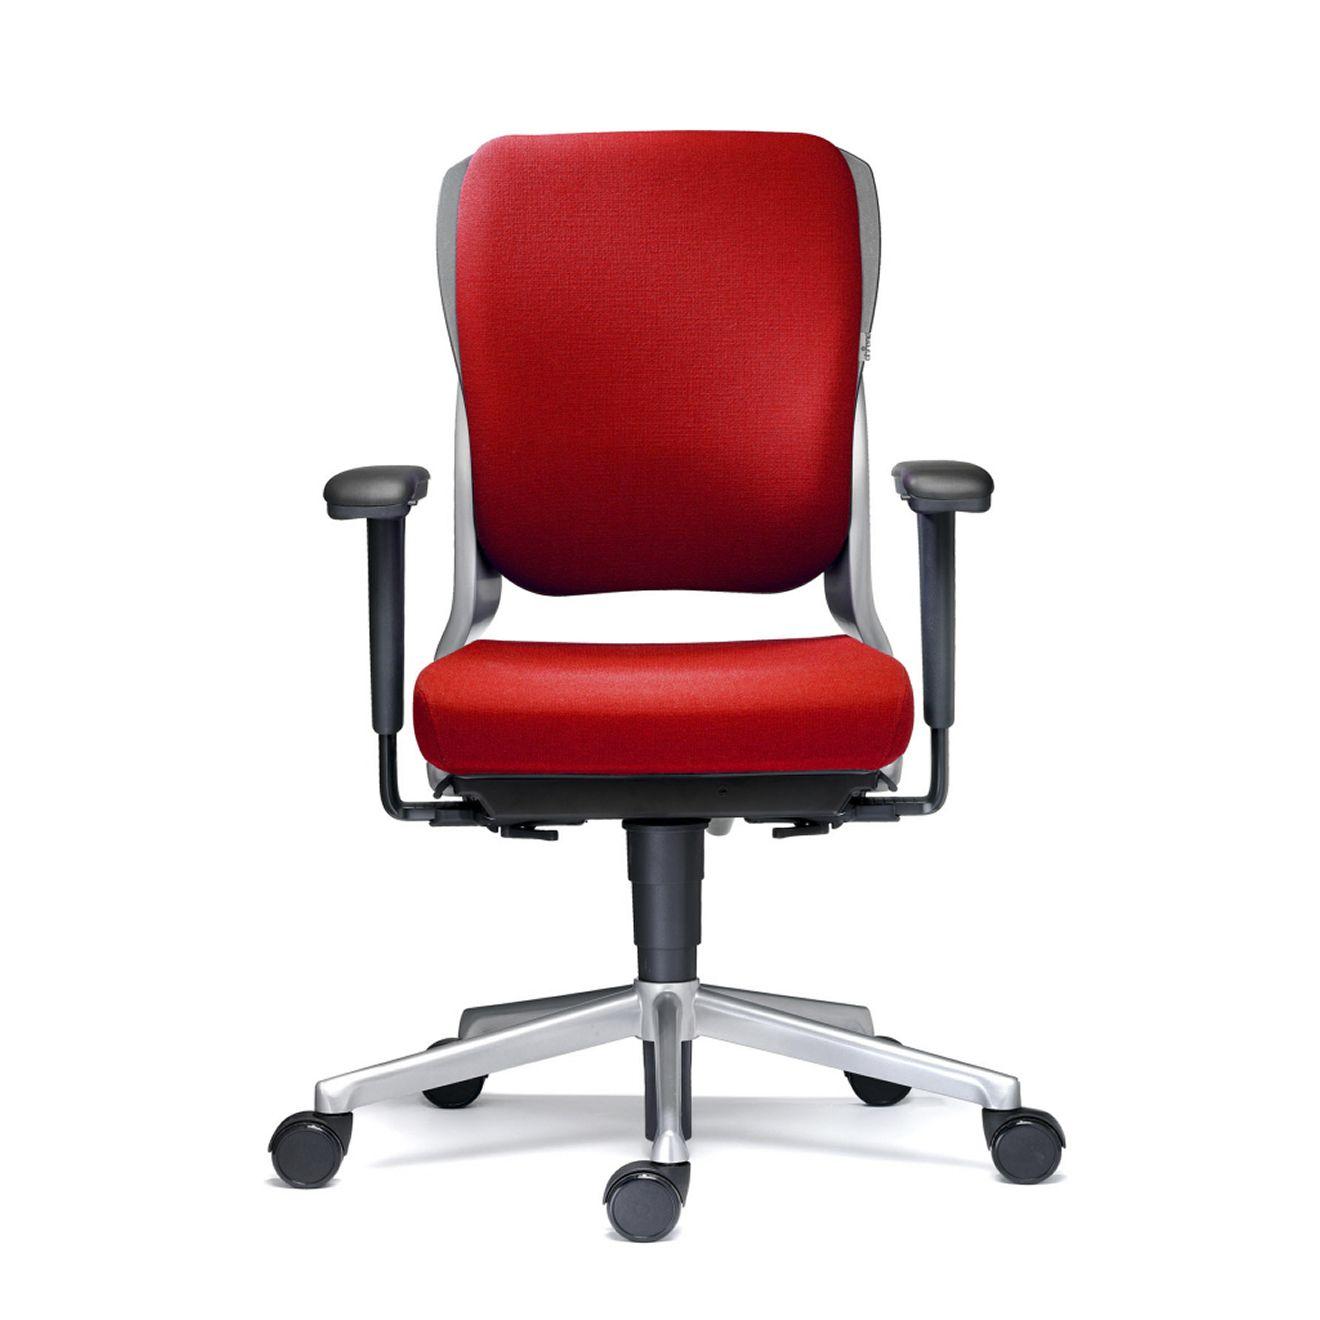 Comforto Bureaustoel D7783.Ahrend 230 Ahrend Ahrend Chair Furniture En Home Decor